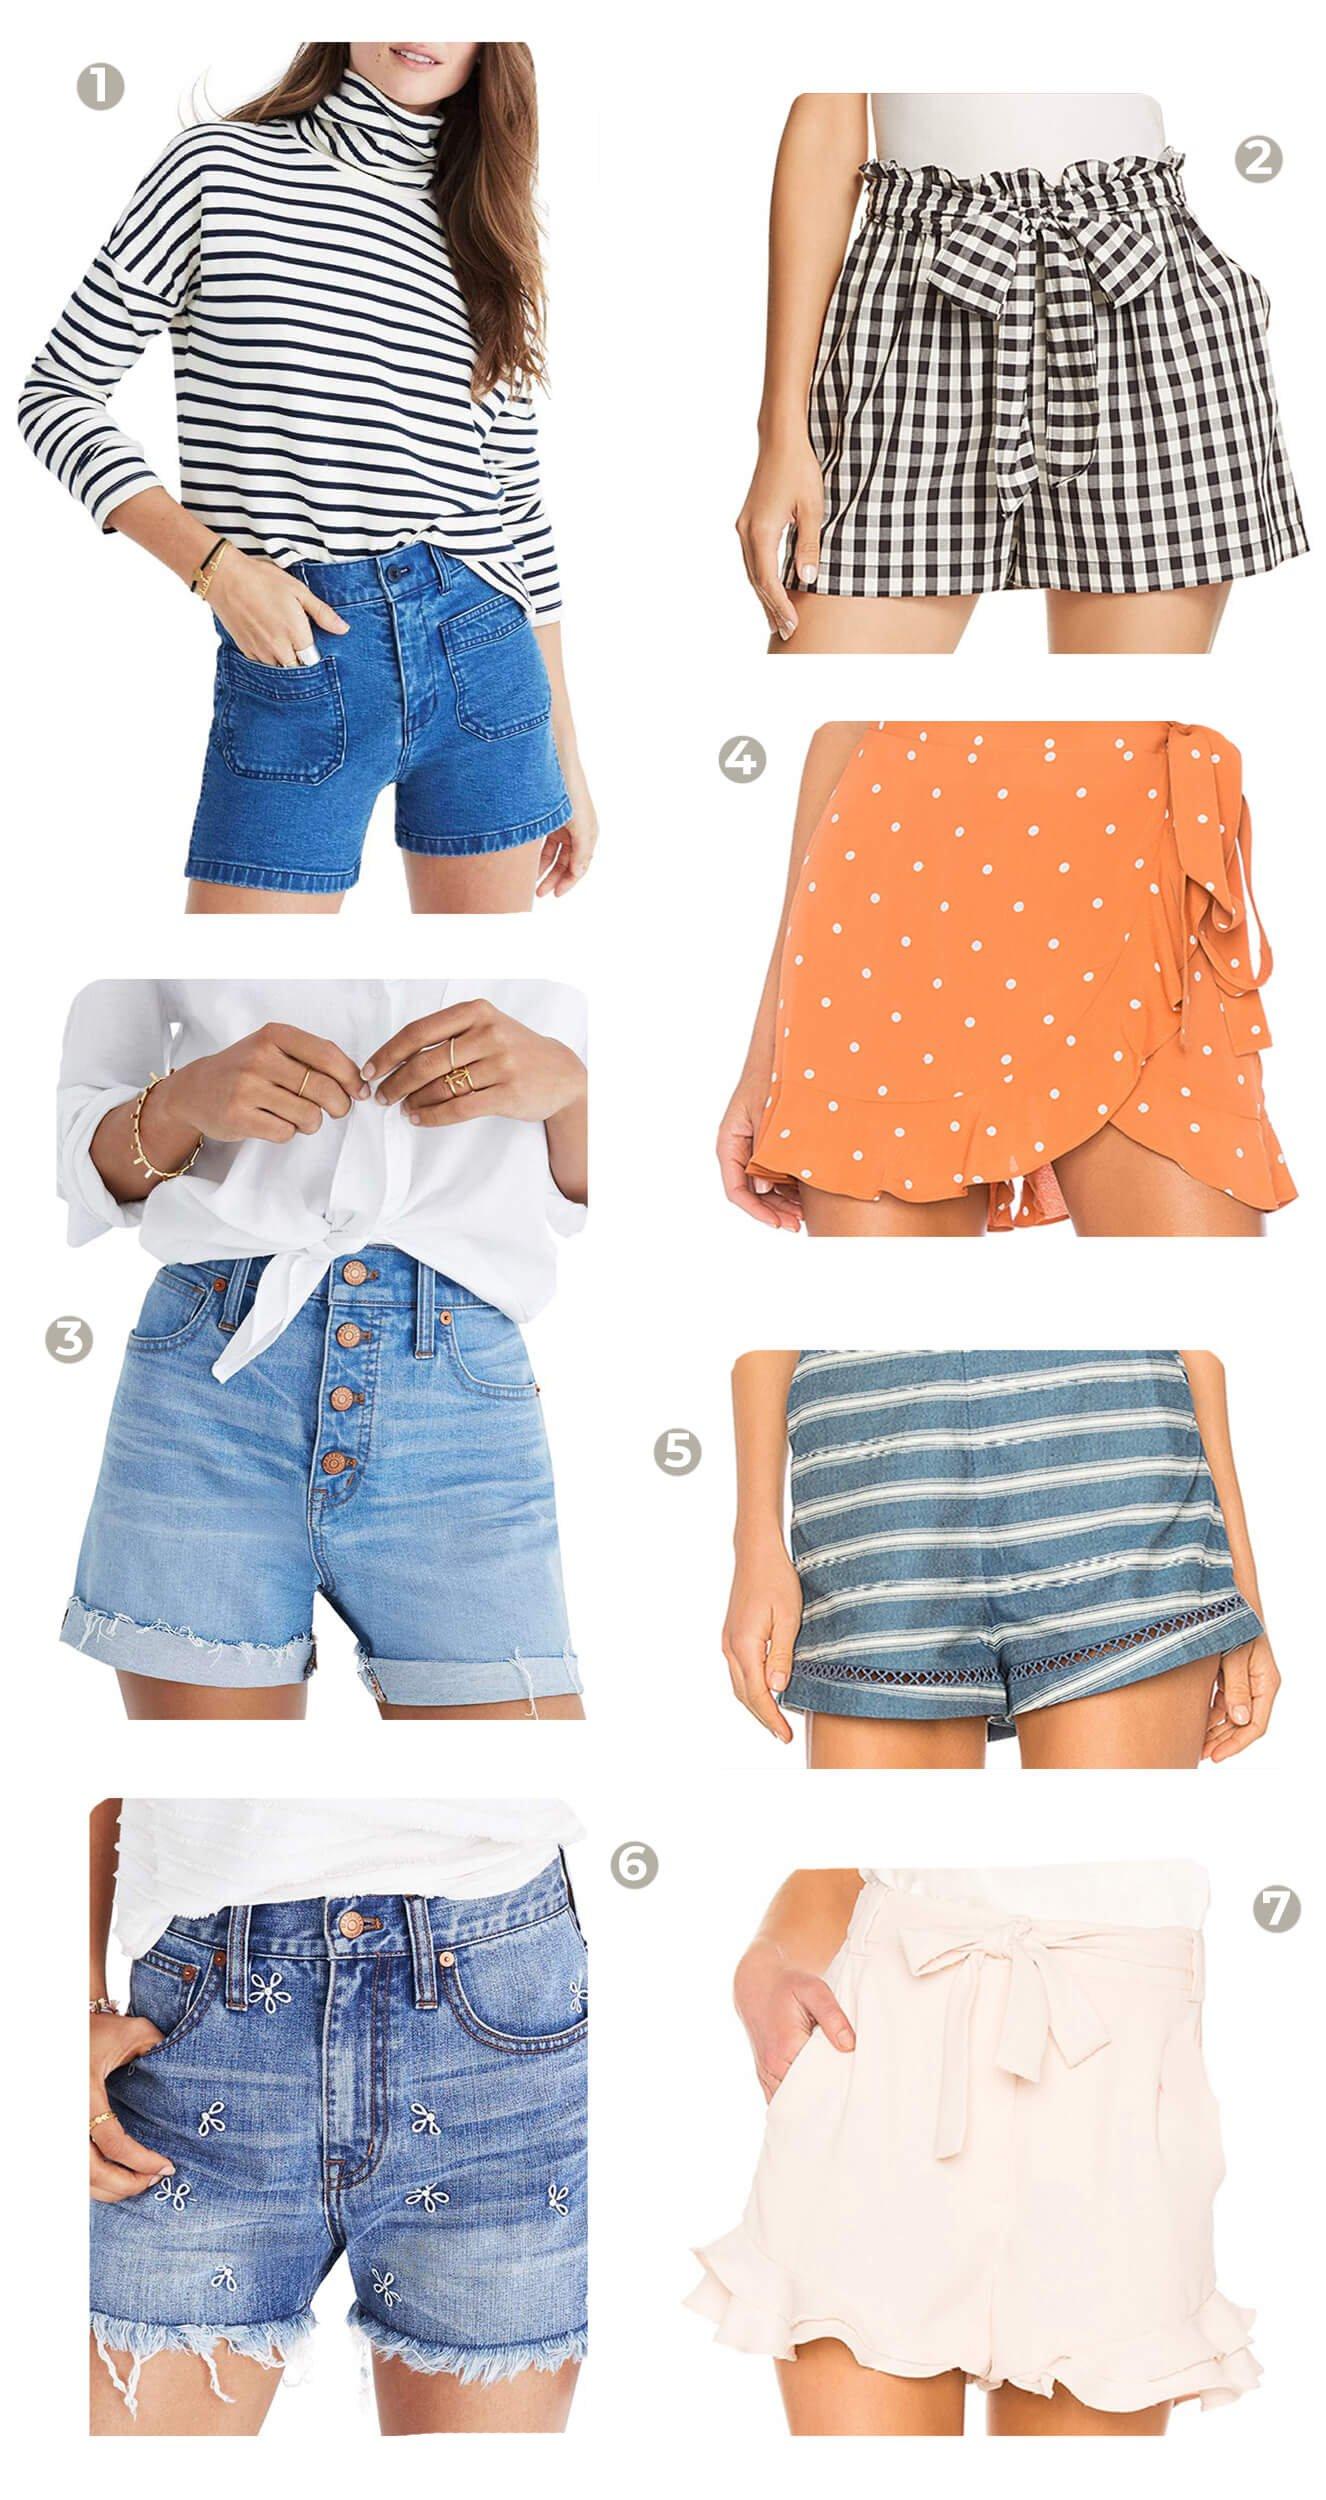 Spring Capsule Wardrobe Ideas – A Beautiful Mess 99